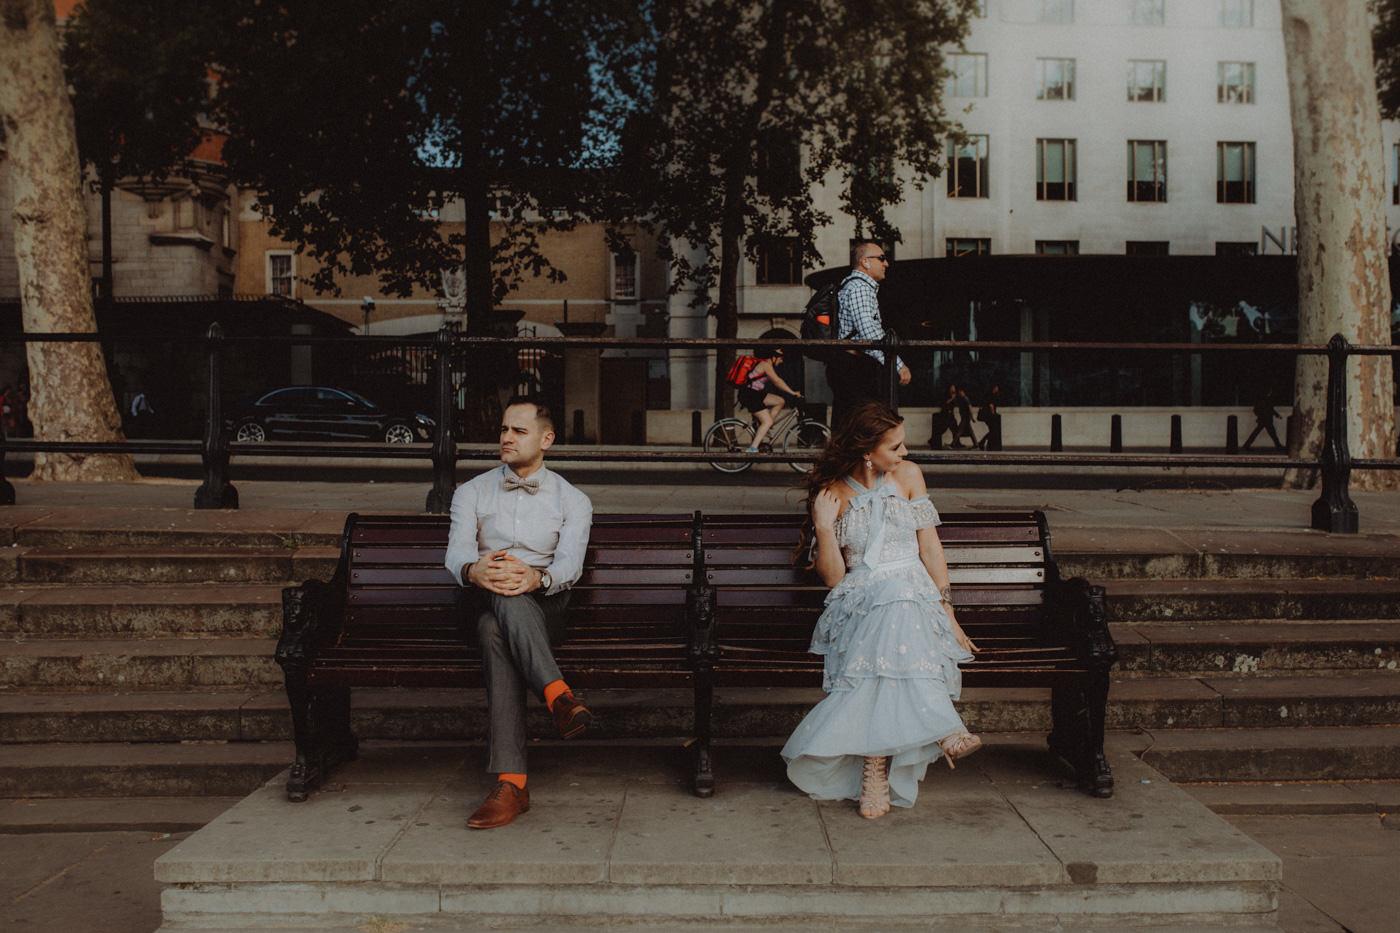 MAGDA & TOMEK - LONDON ASYLUM CHAPEL & SEVEN SISTERS CLIFFS 9